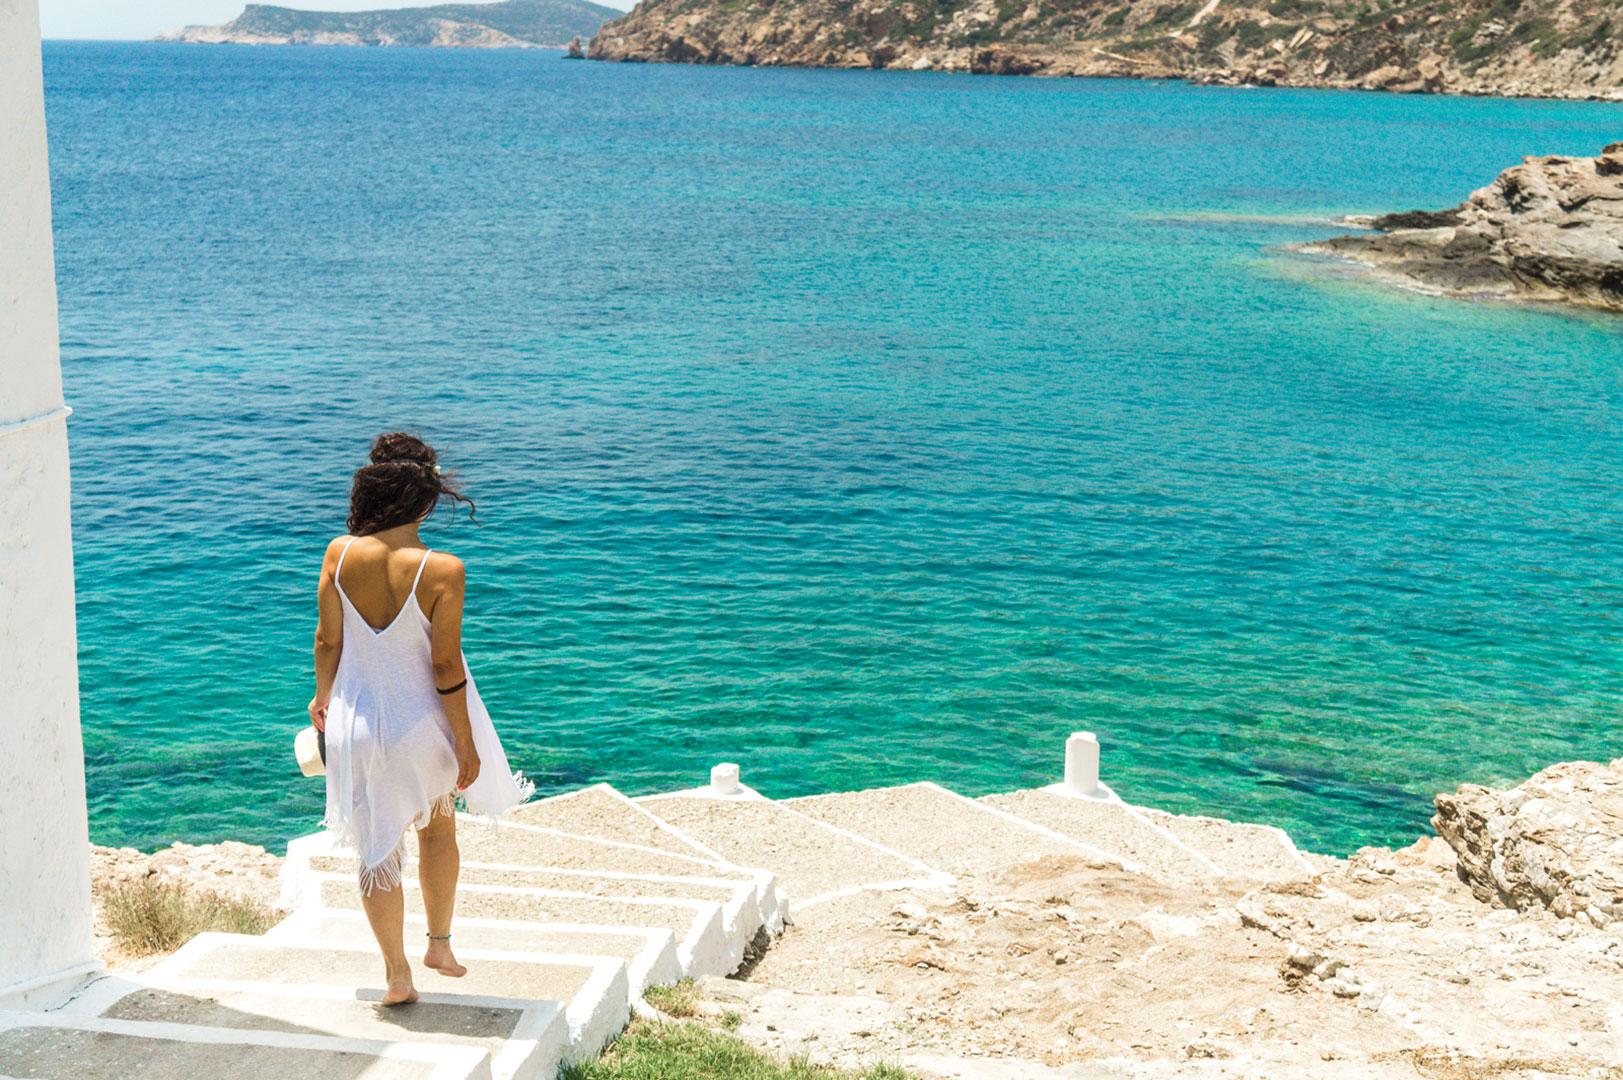 sifnos-greece-la-vie-en-blog-all-rights-reserved-261